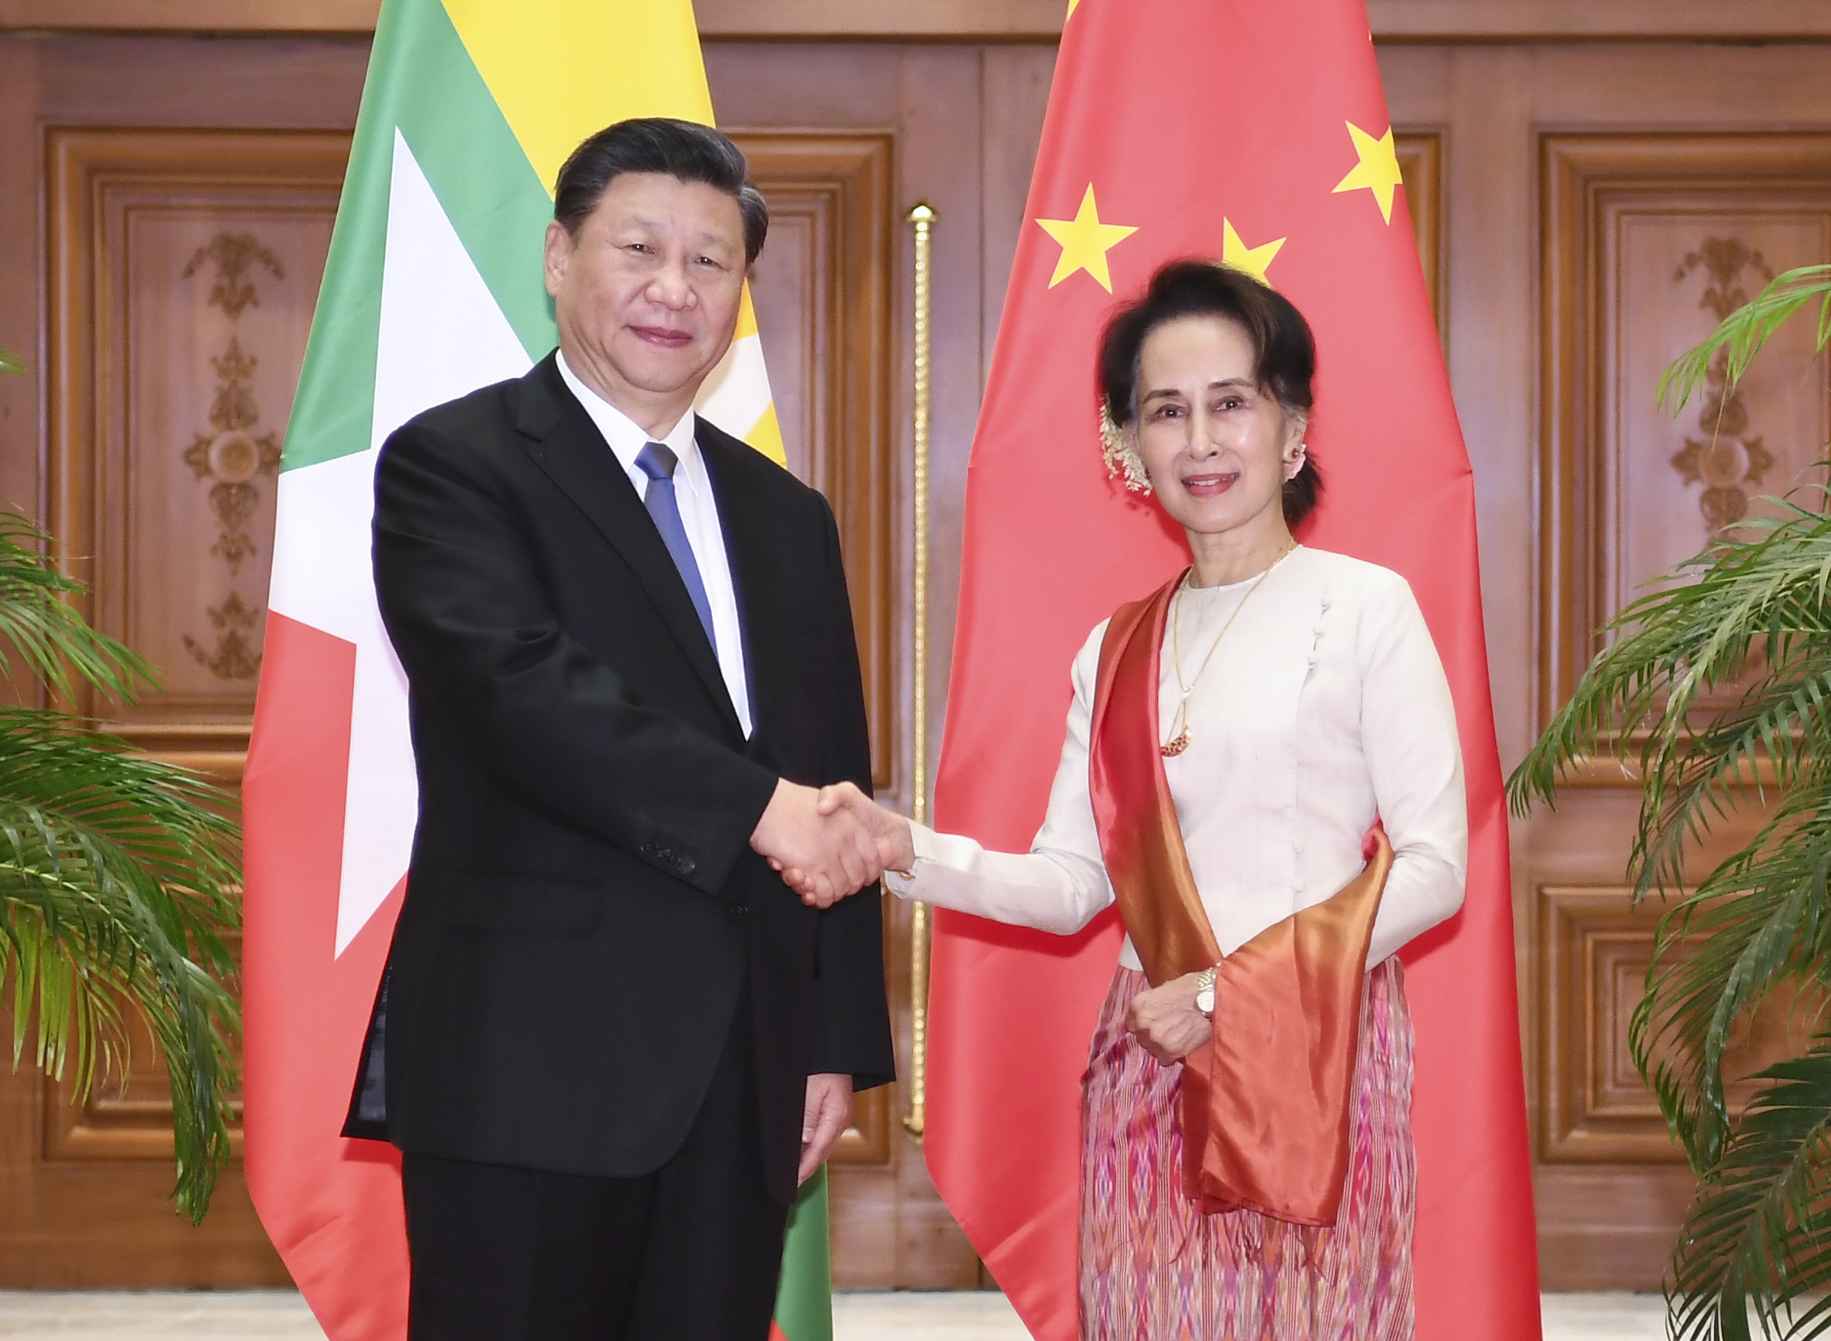 <STRONG>习近平同缅甸国务资政会谈</STRONG>